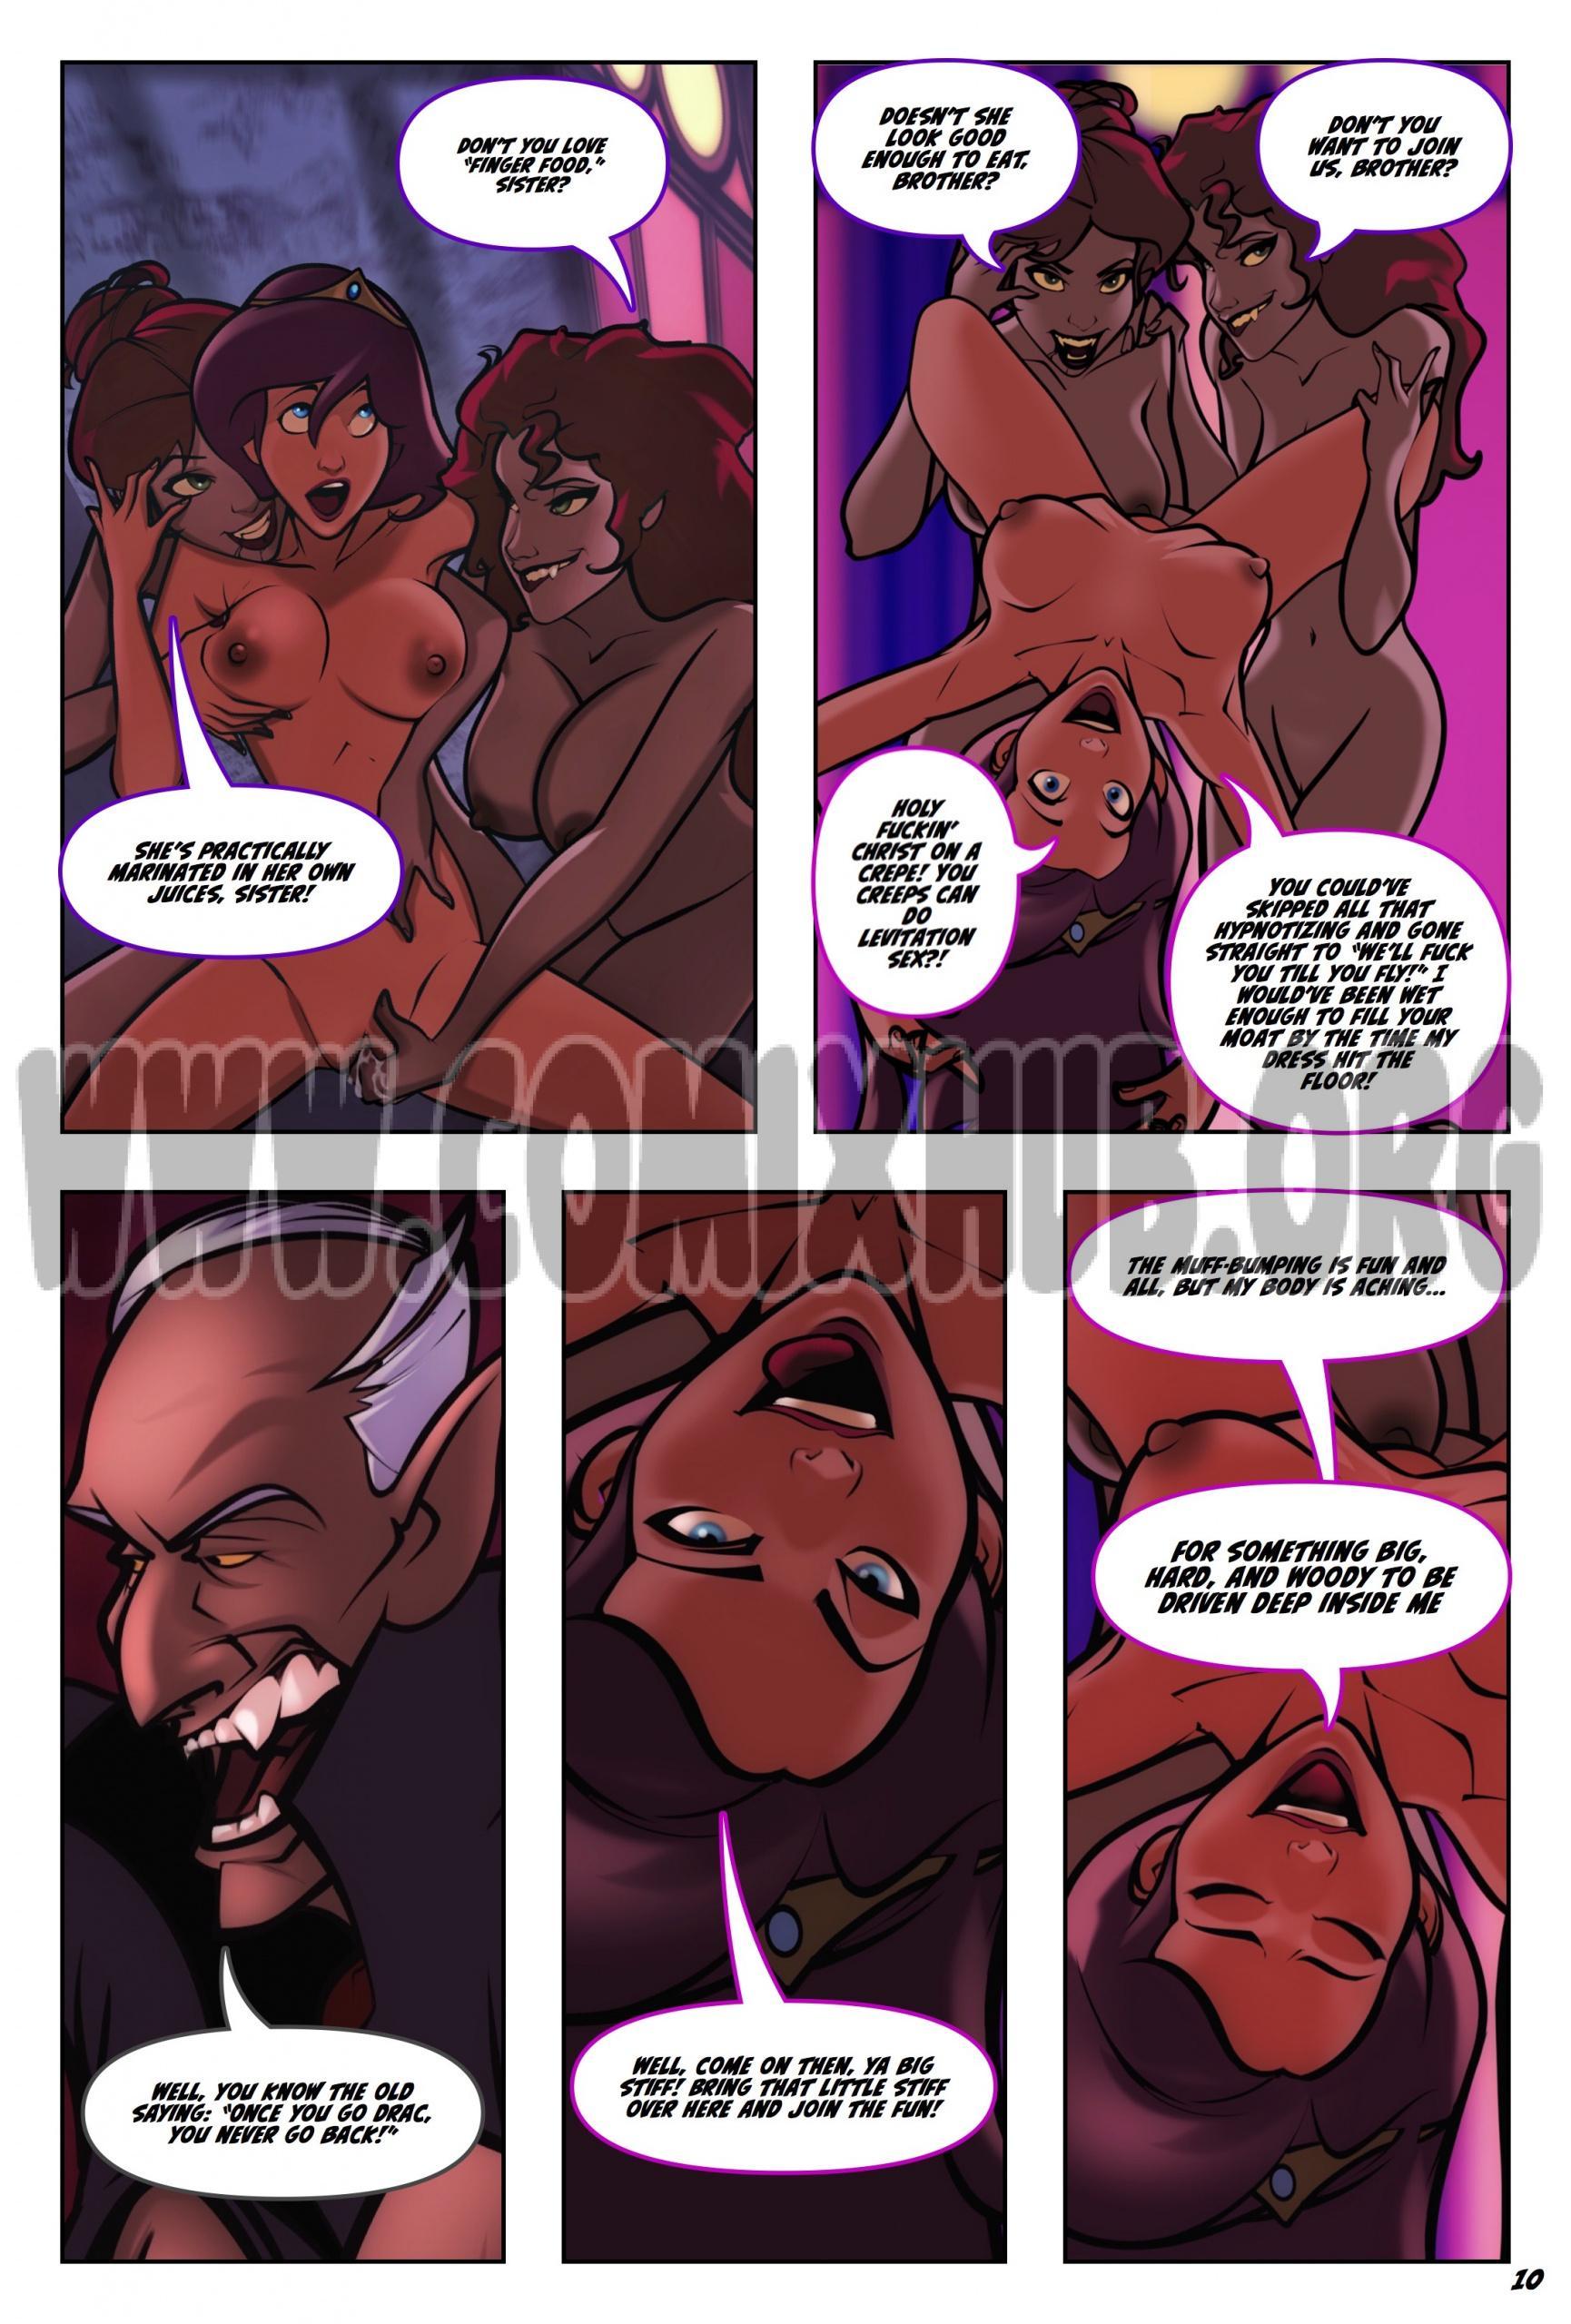 Jackanapes 3 - 4 porn comics Uncategorized